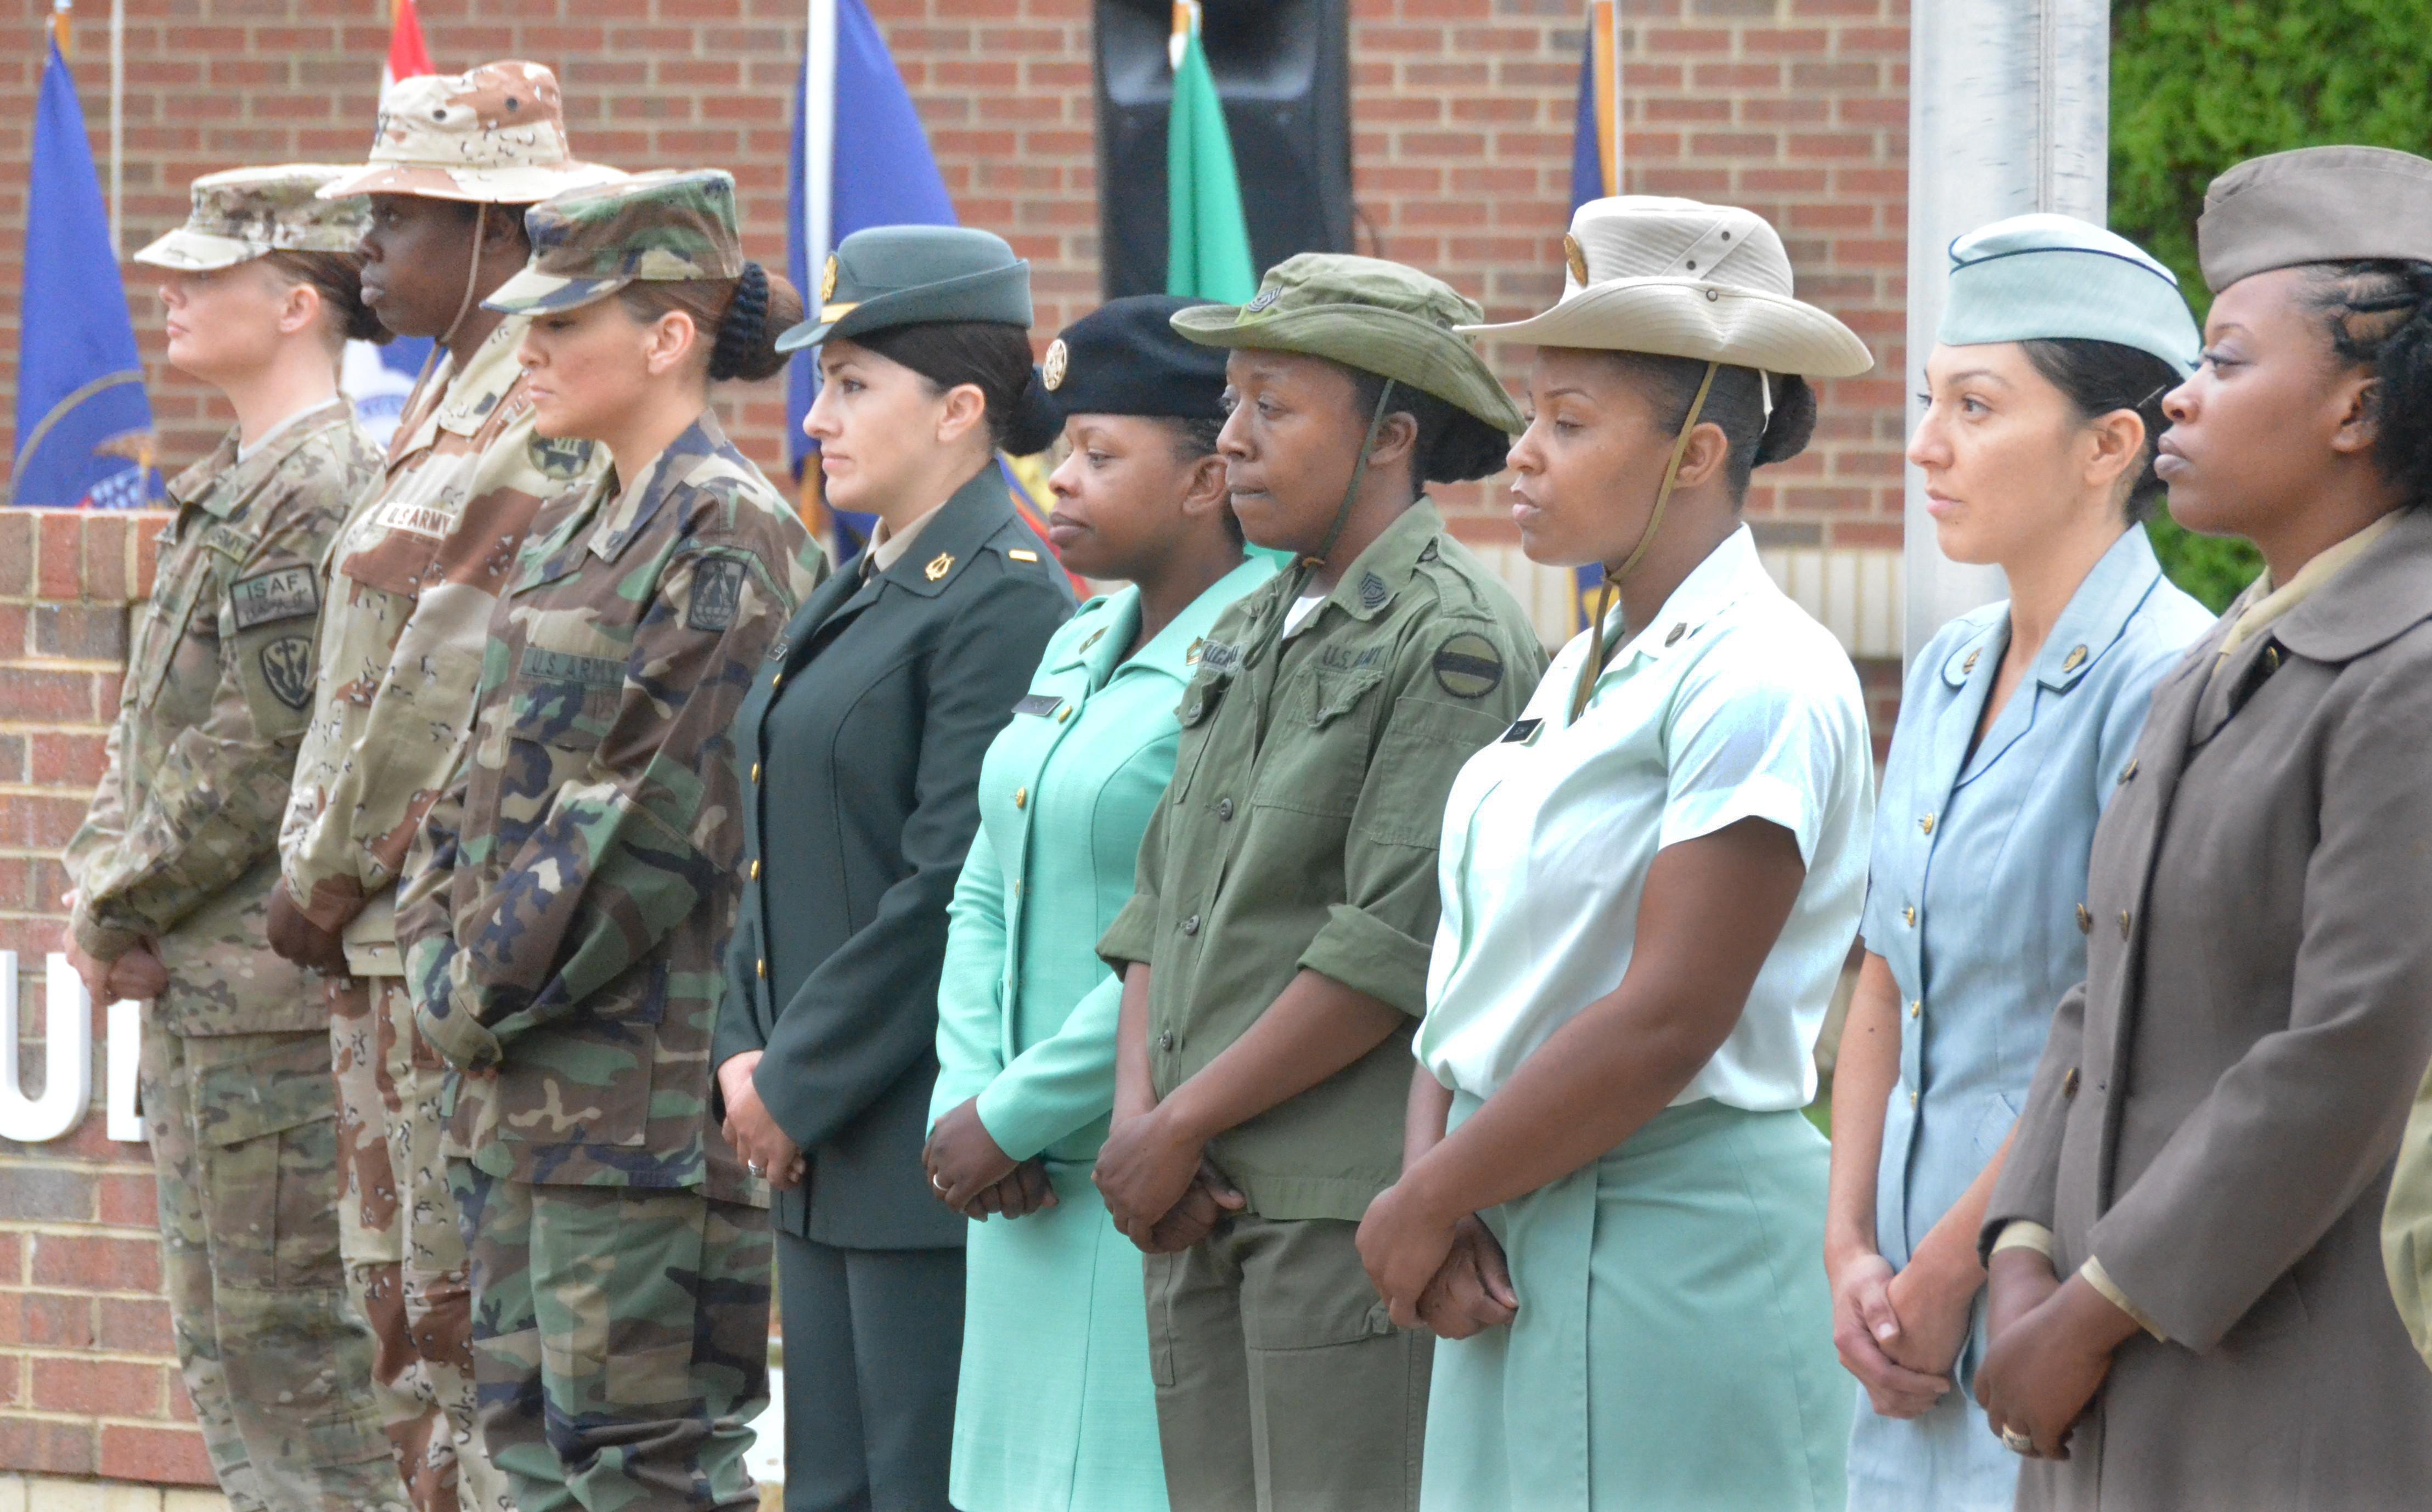 U.s. Army Women Uniform 'Lt. FAWMA' -- Army Wo...